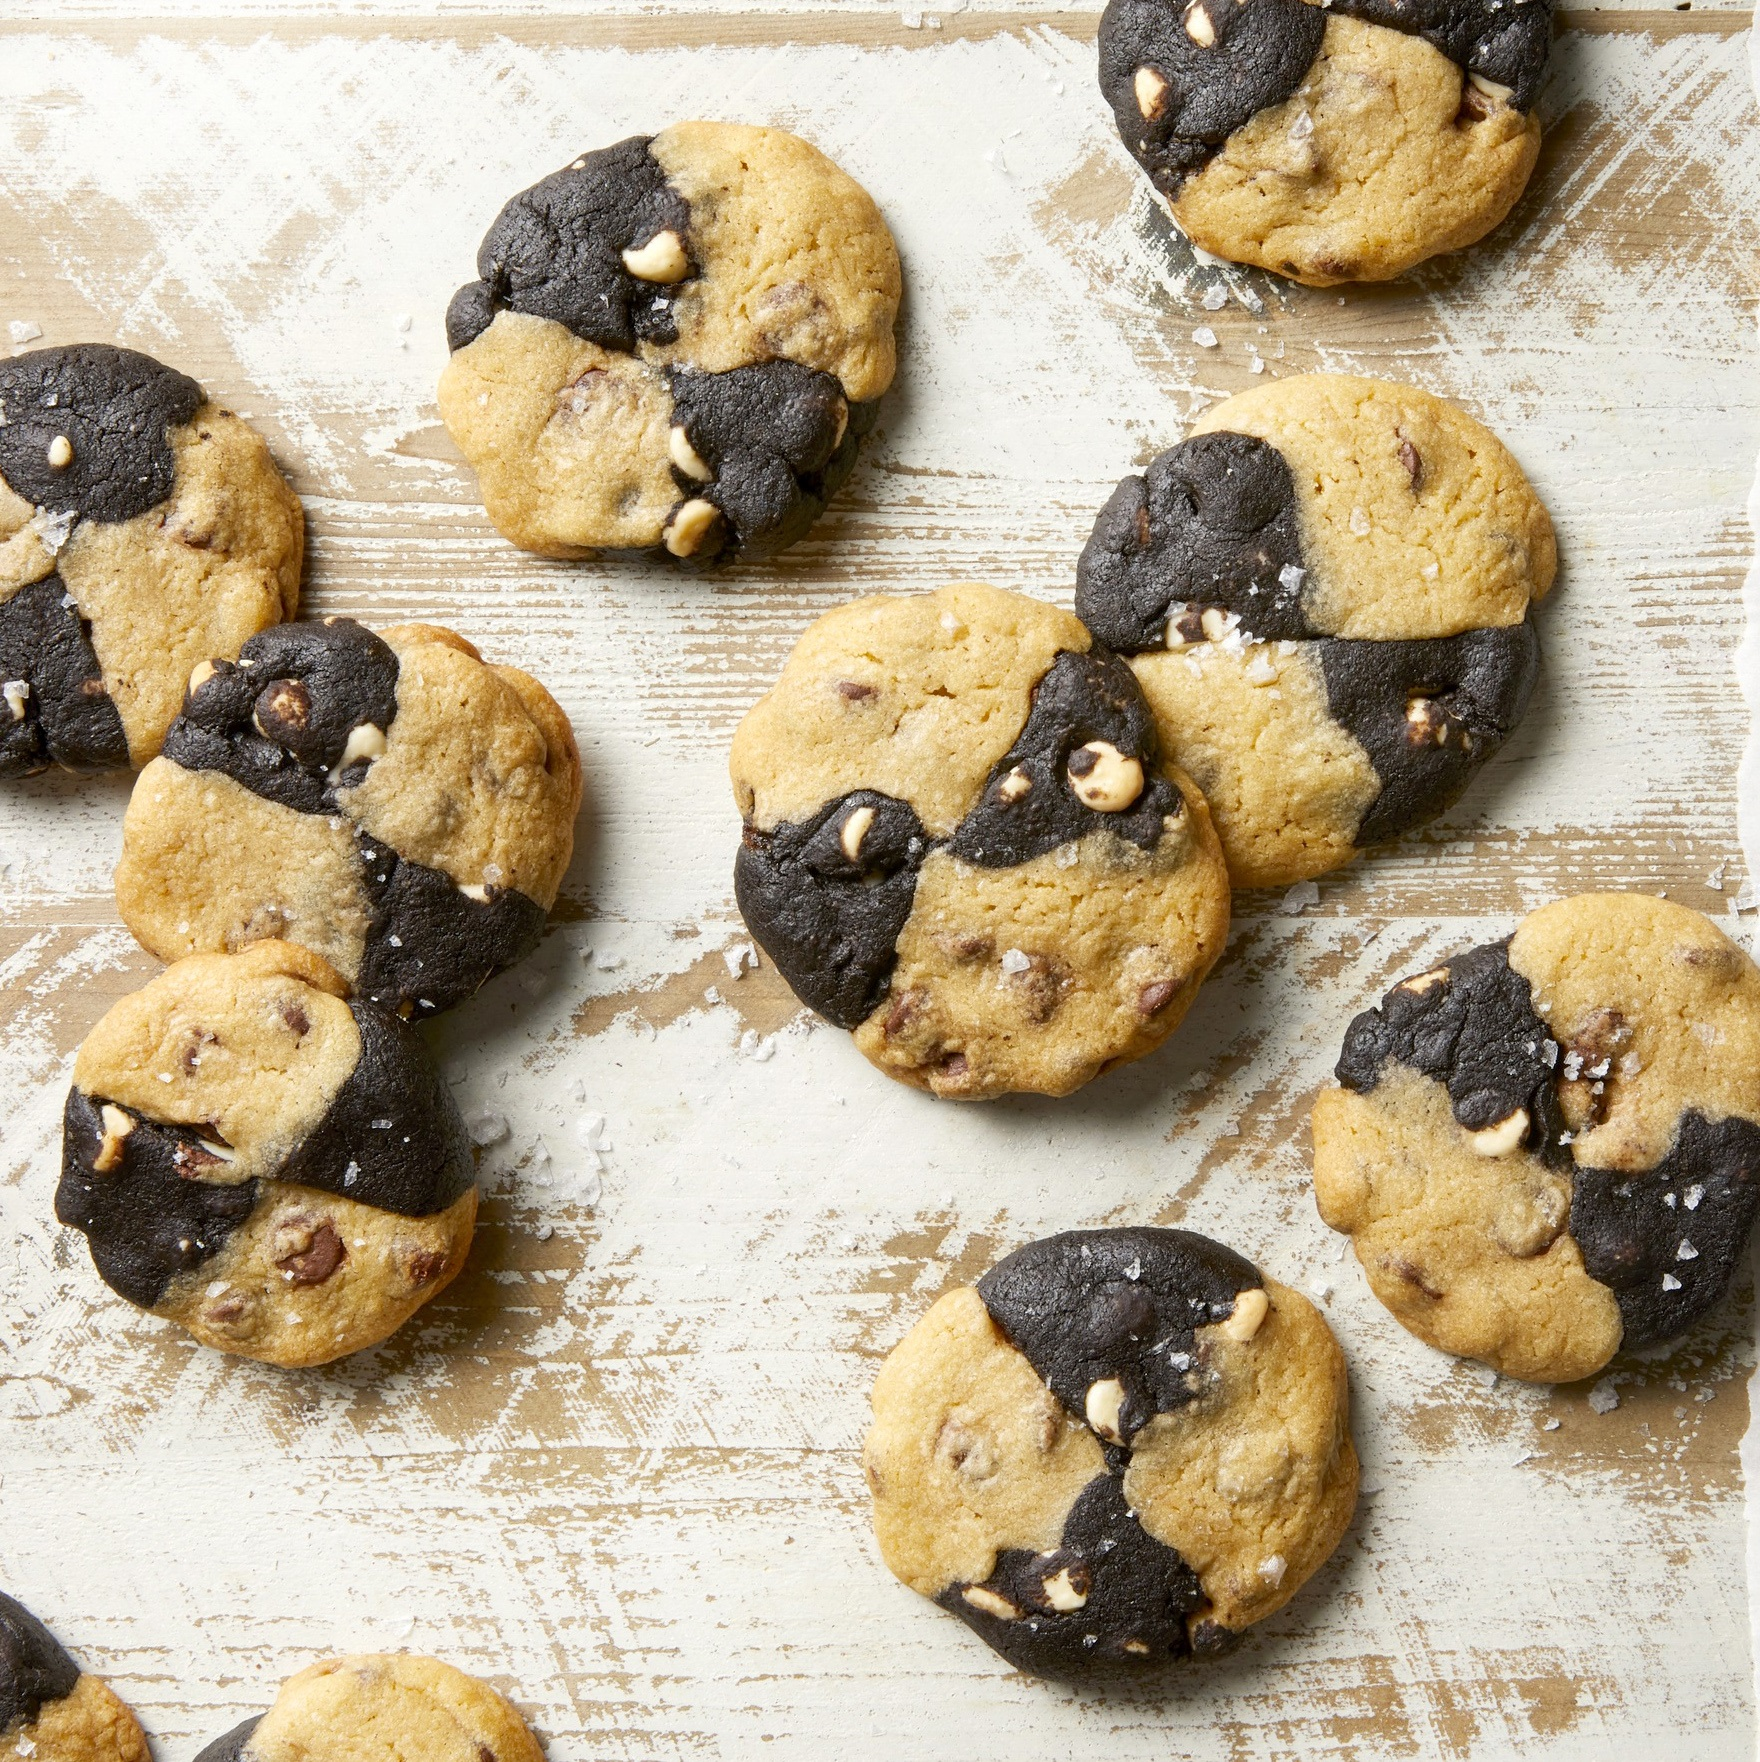 Chocolate Chip Crisscross Cookies